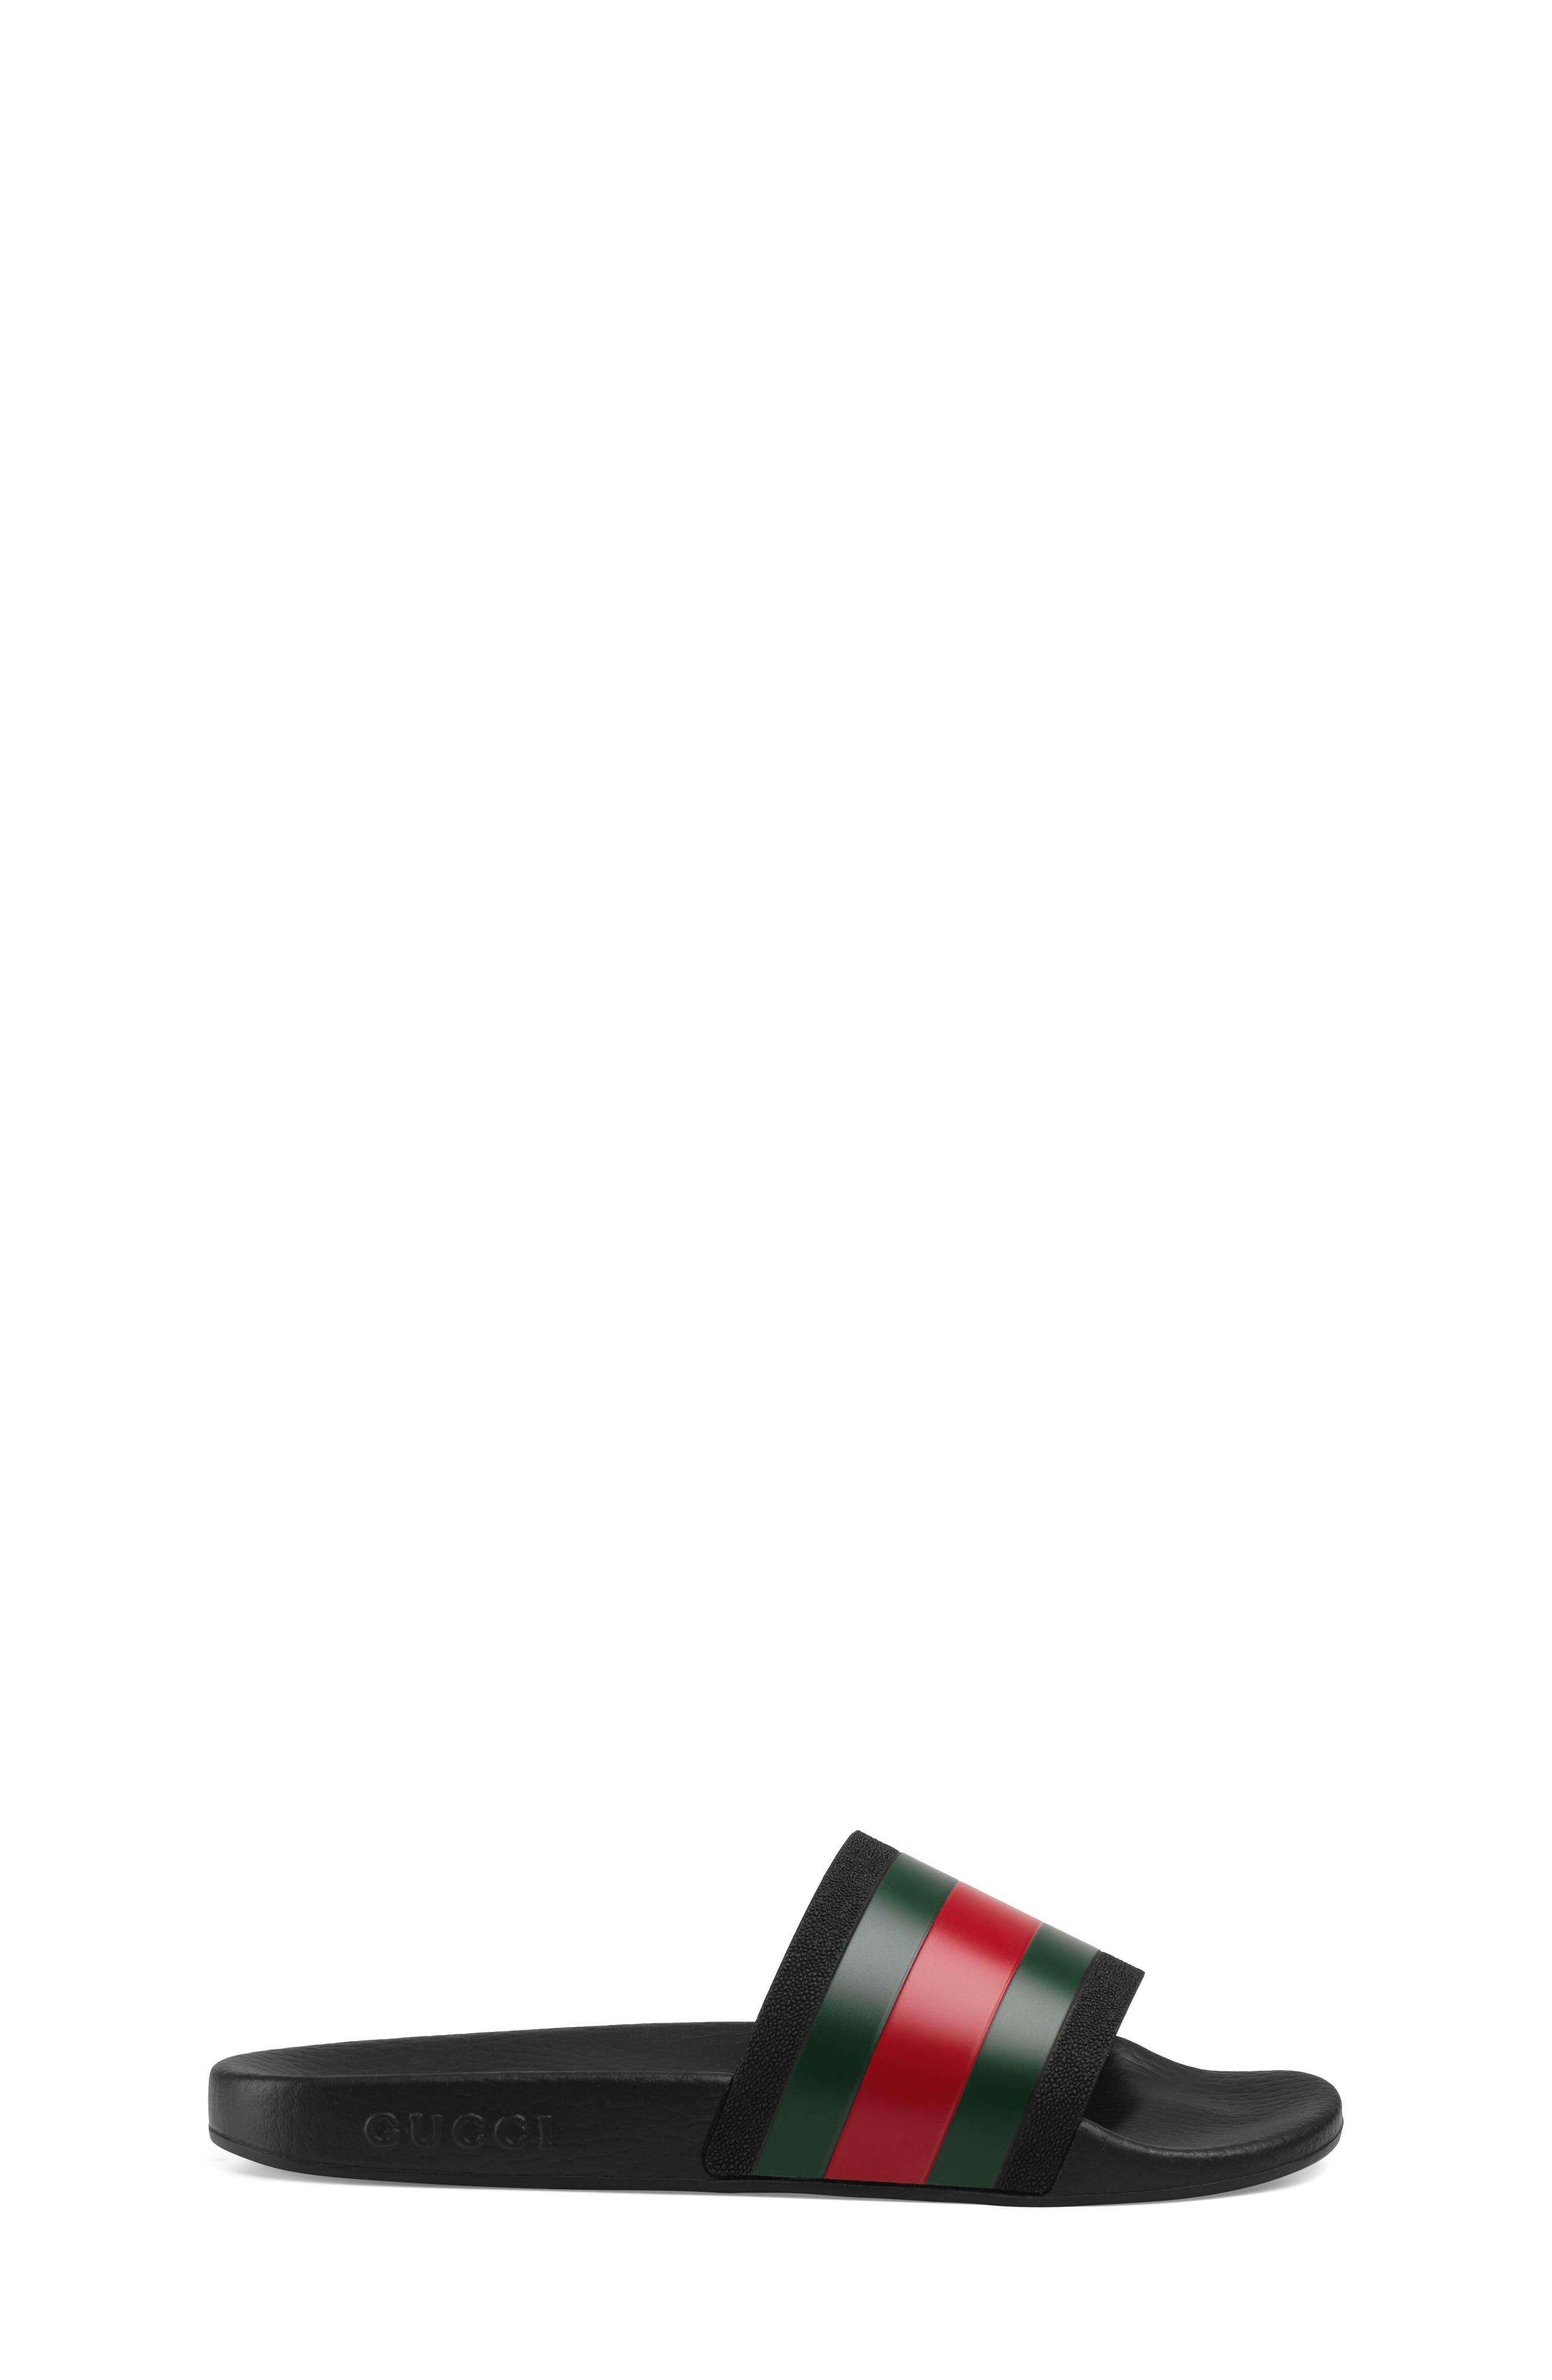 GUCCI, Pursuit Slide Sandal, Alternate thumbnail 3, color, BLACK/ GREEN/ RED